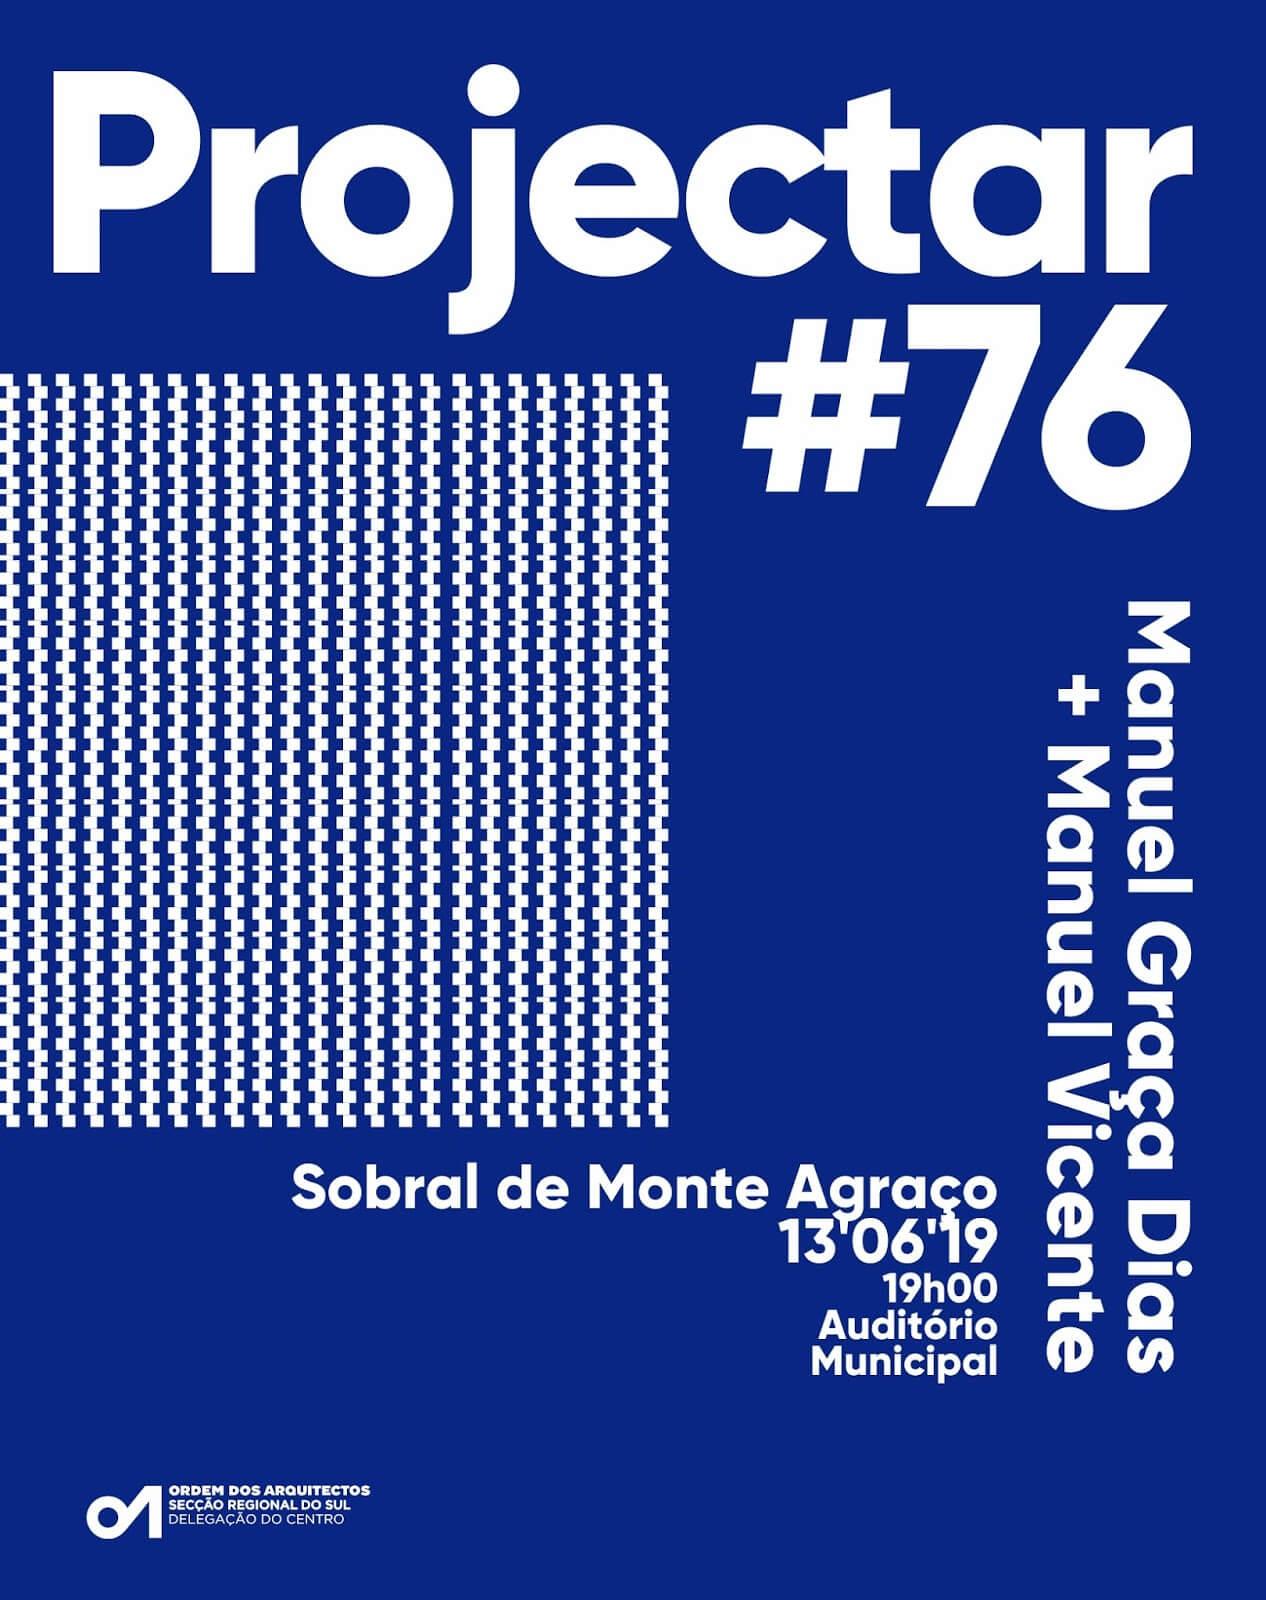 PROJECTAR #76: Manuel Graça Dias + Manuel Vicente